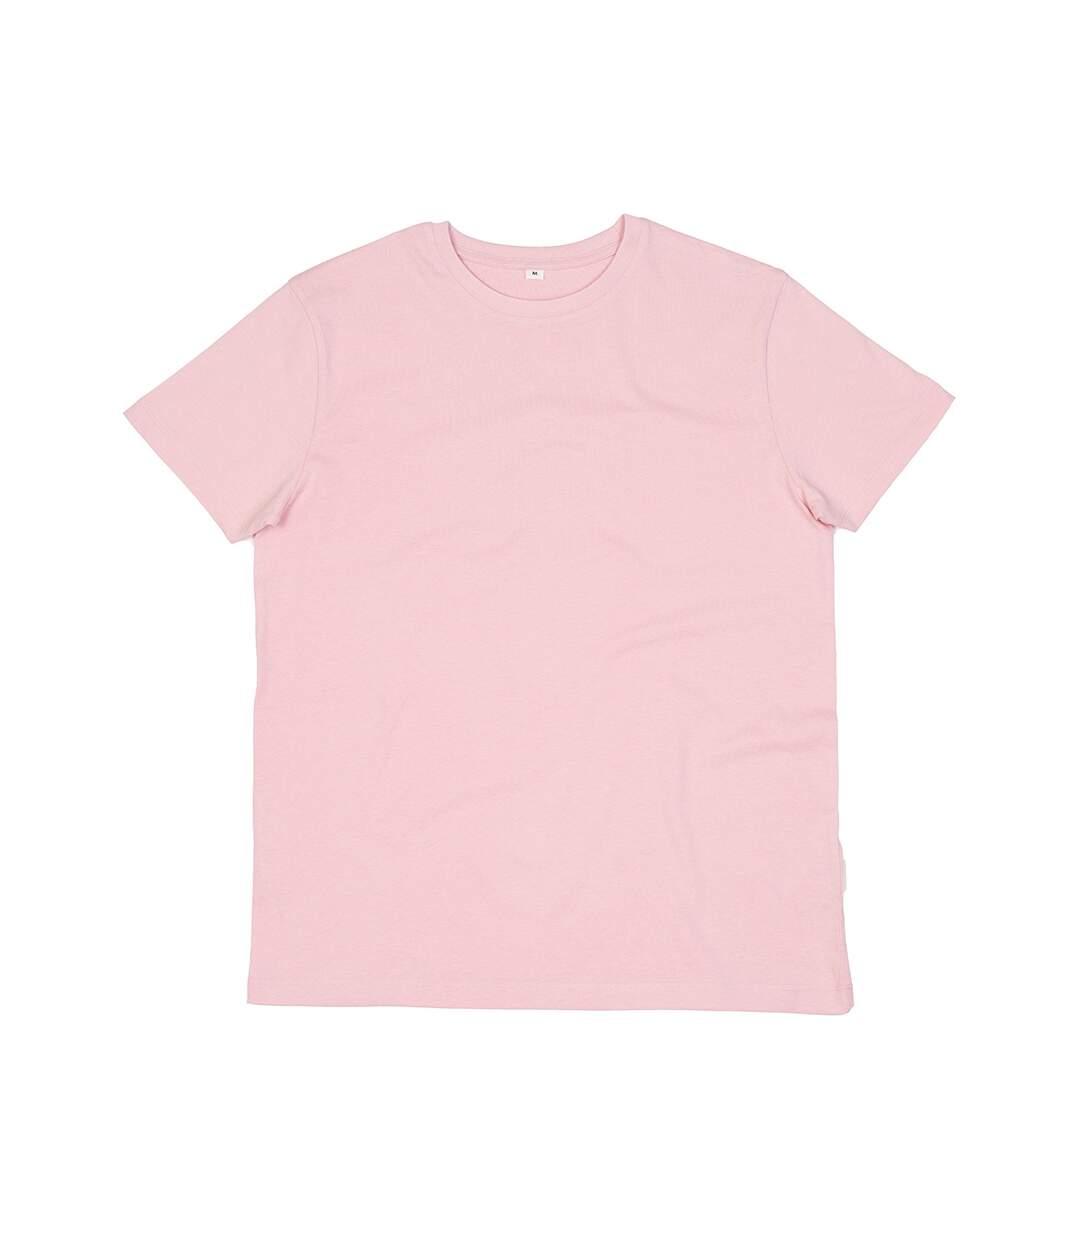 Mantis Mens Organic T-Shirt (Soft Pink) - UTPC3964